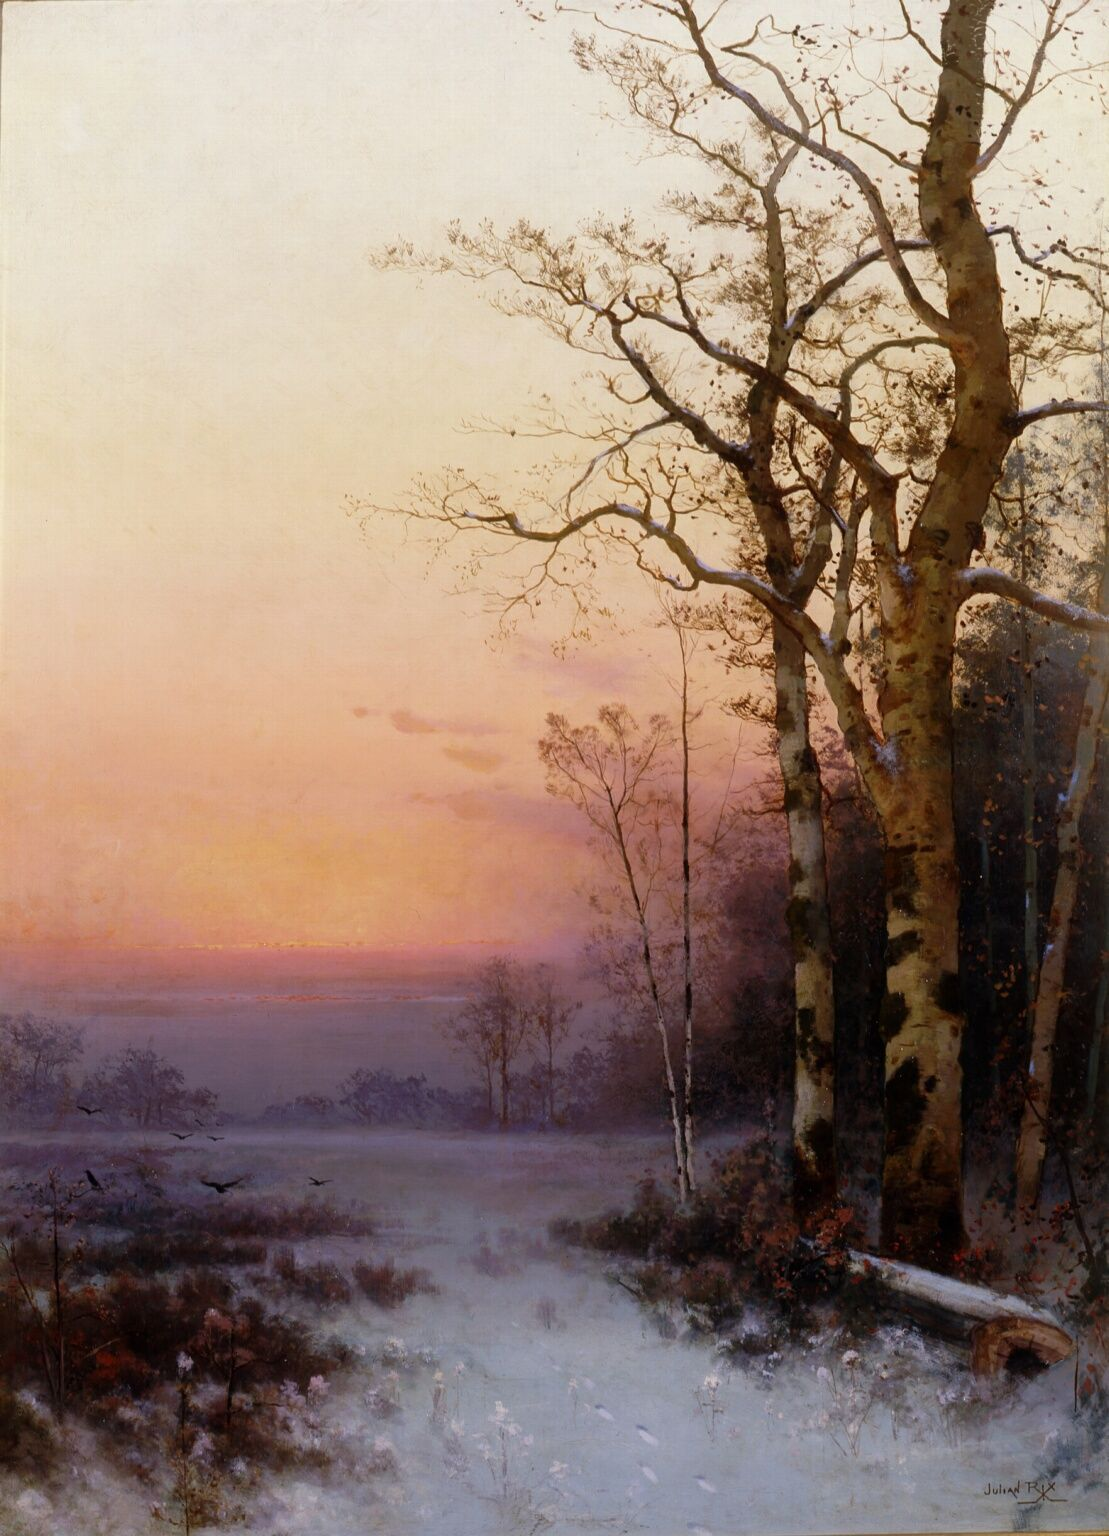 Julian Rix Untitled Winter Twilight C 1880 Winter Landscape Painting Landscape Art Landscape Paintings